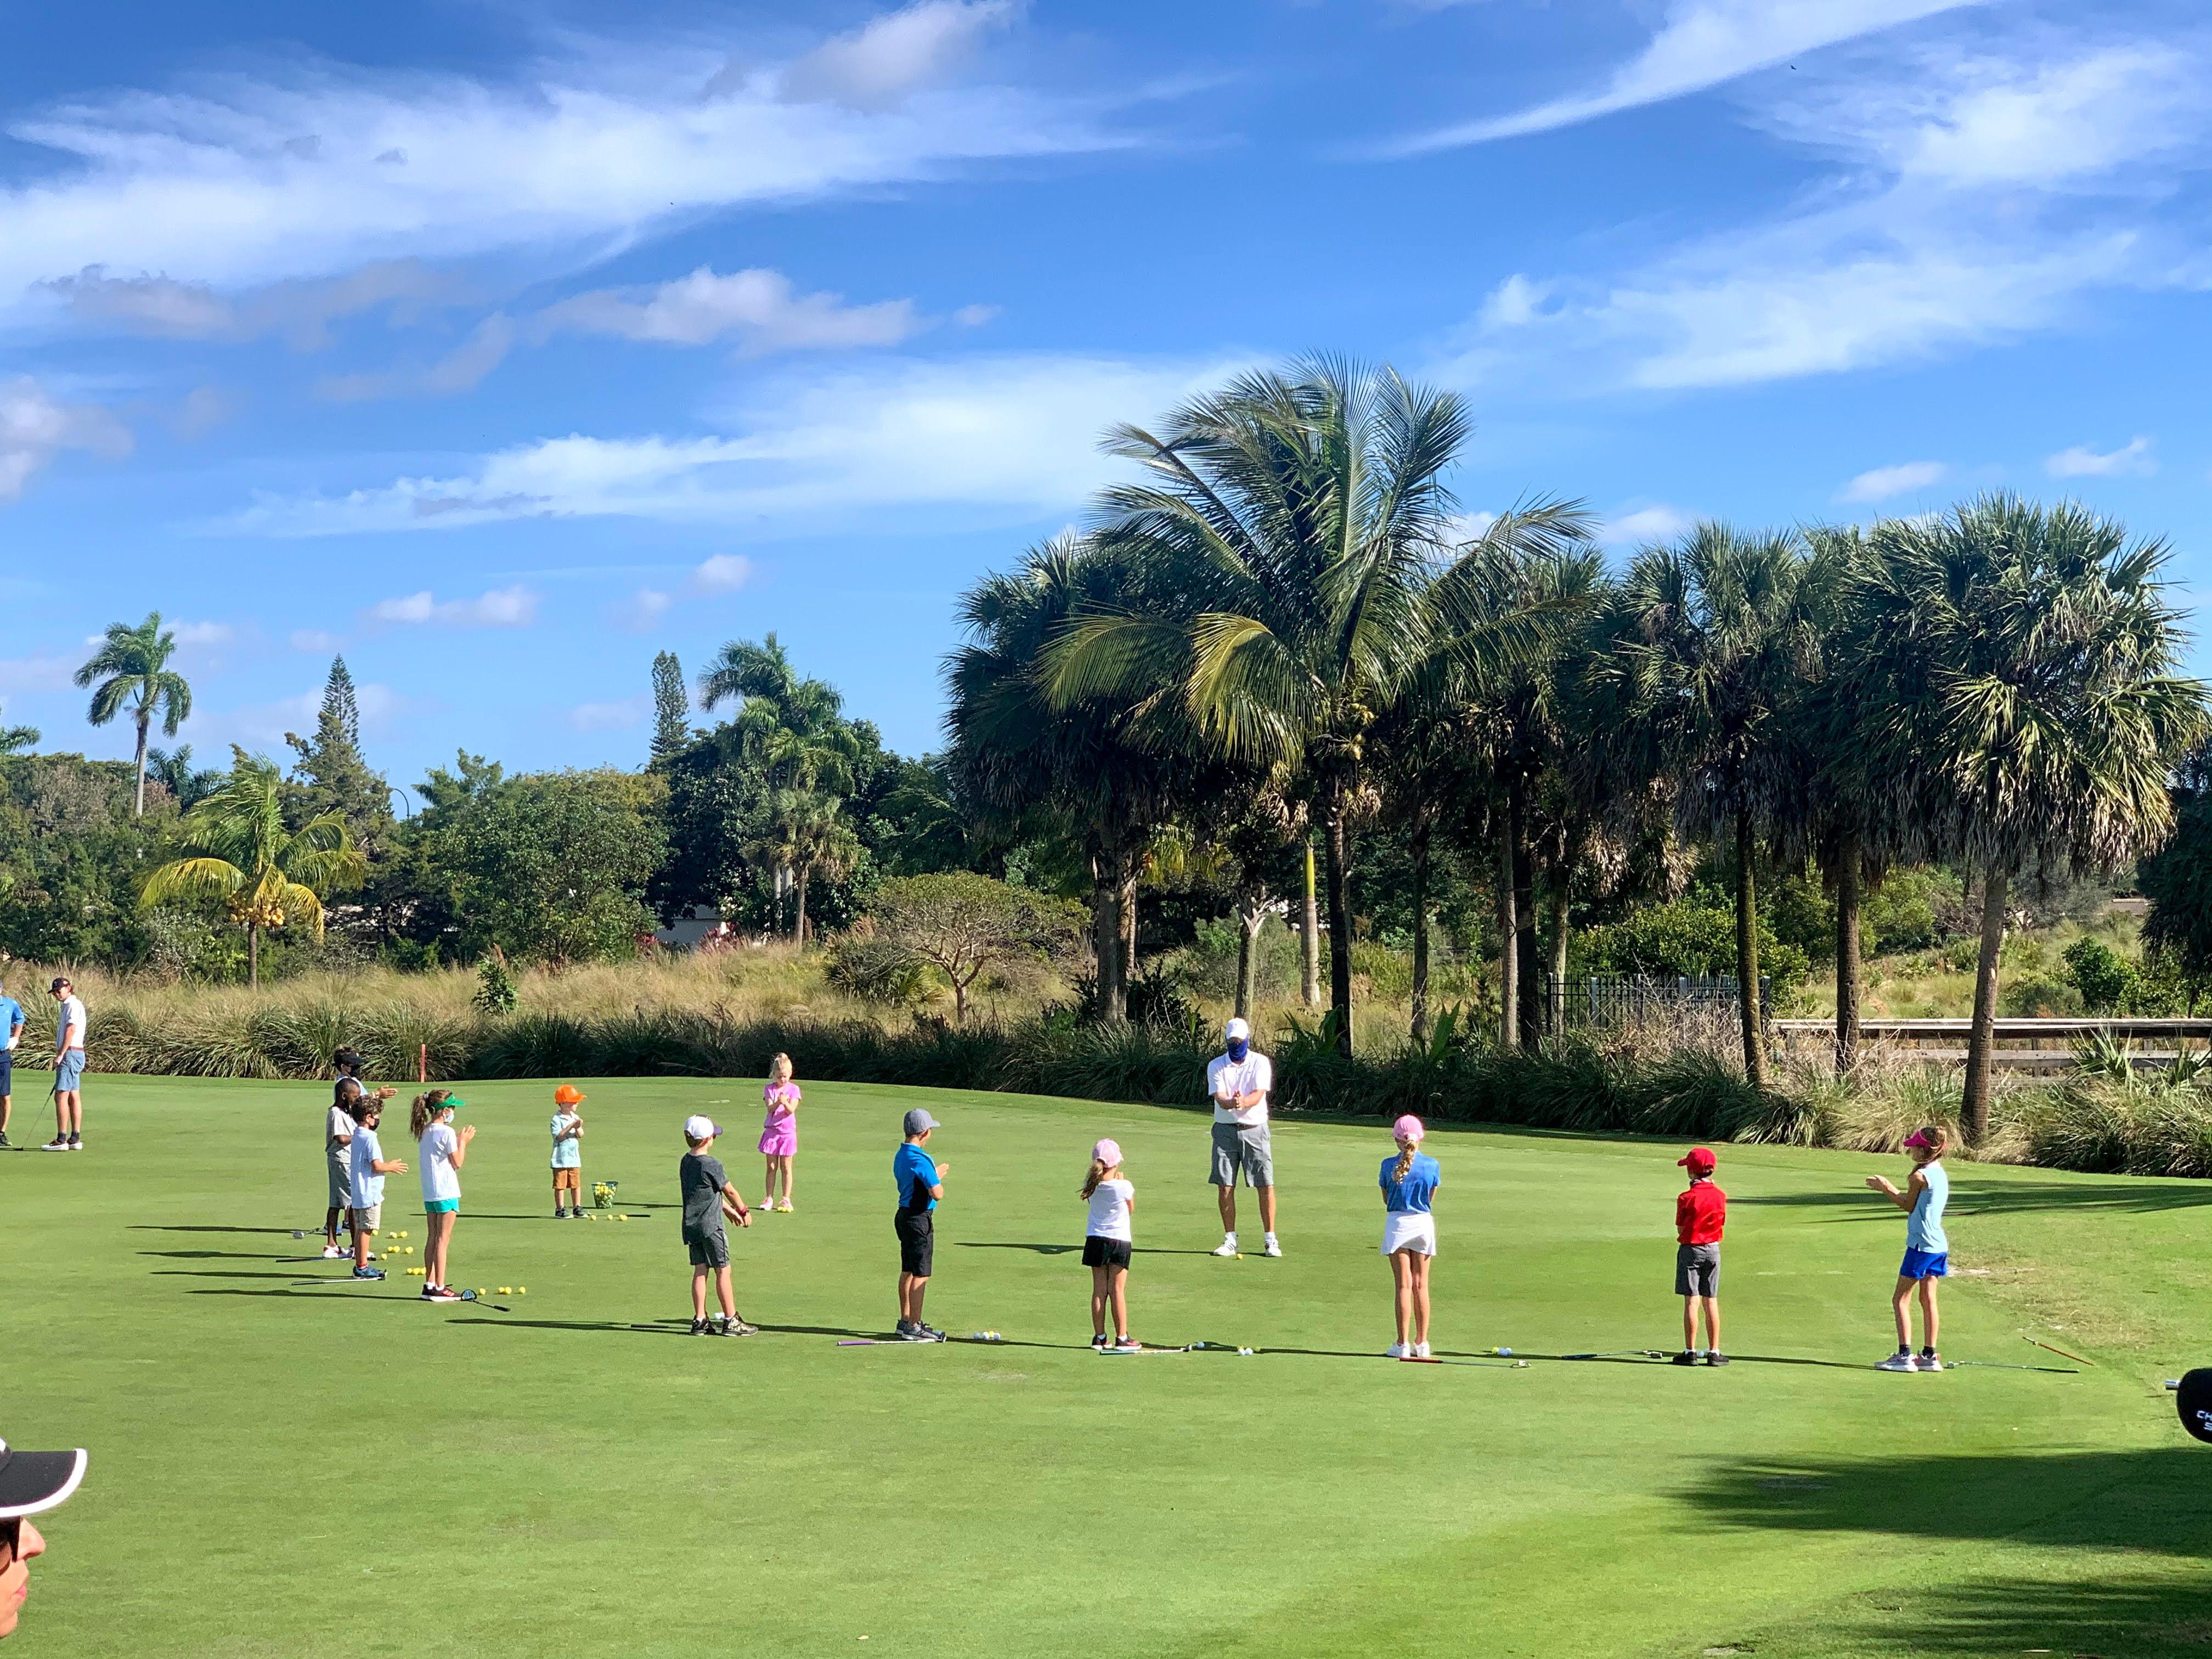 After School Golf 1 (ages 7-9, beginner)